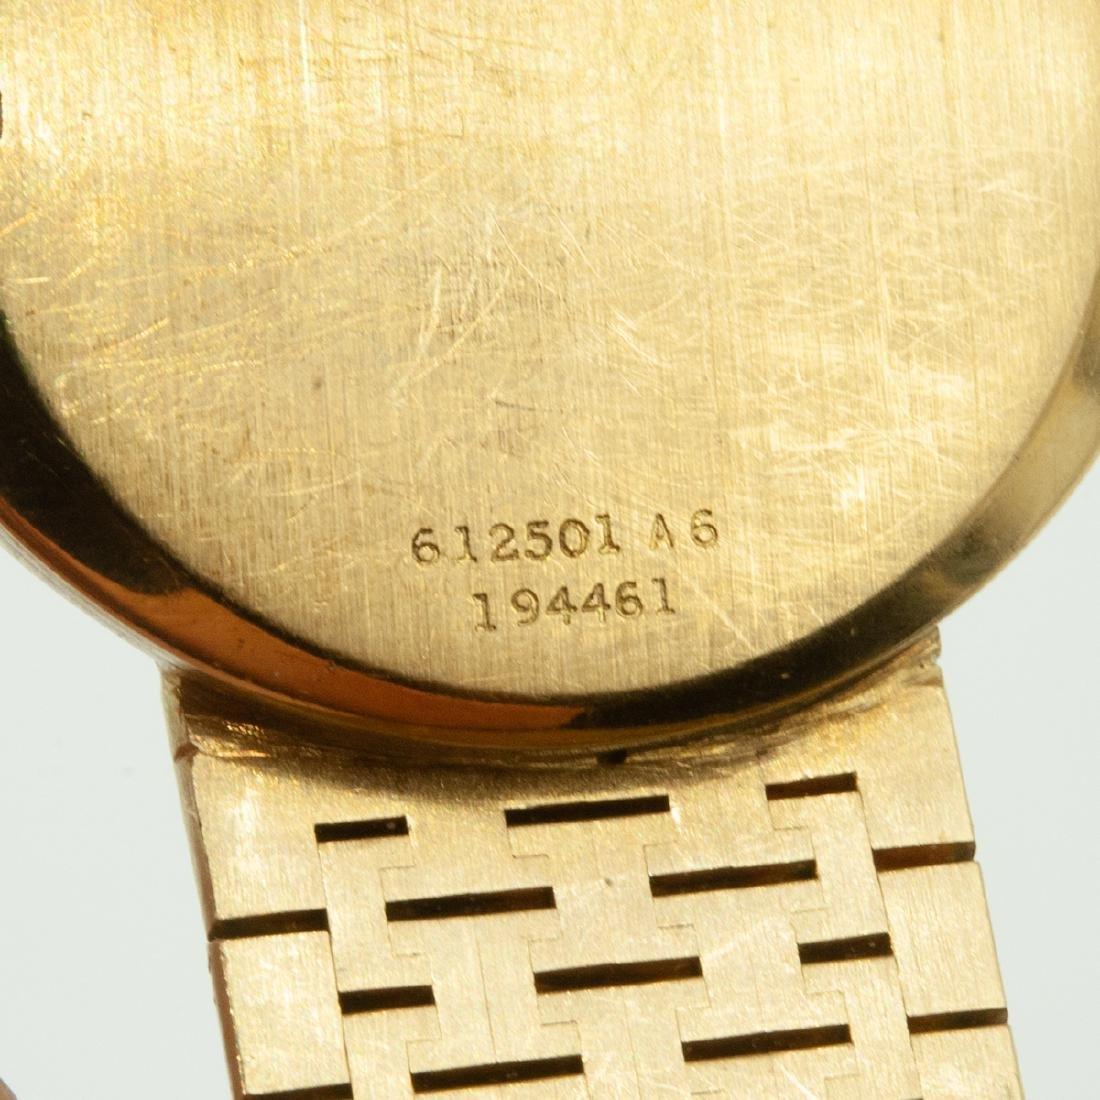 Vintage Piaget dual time watch - 3